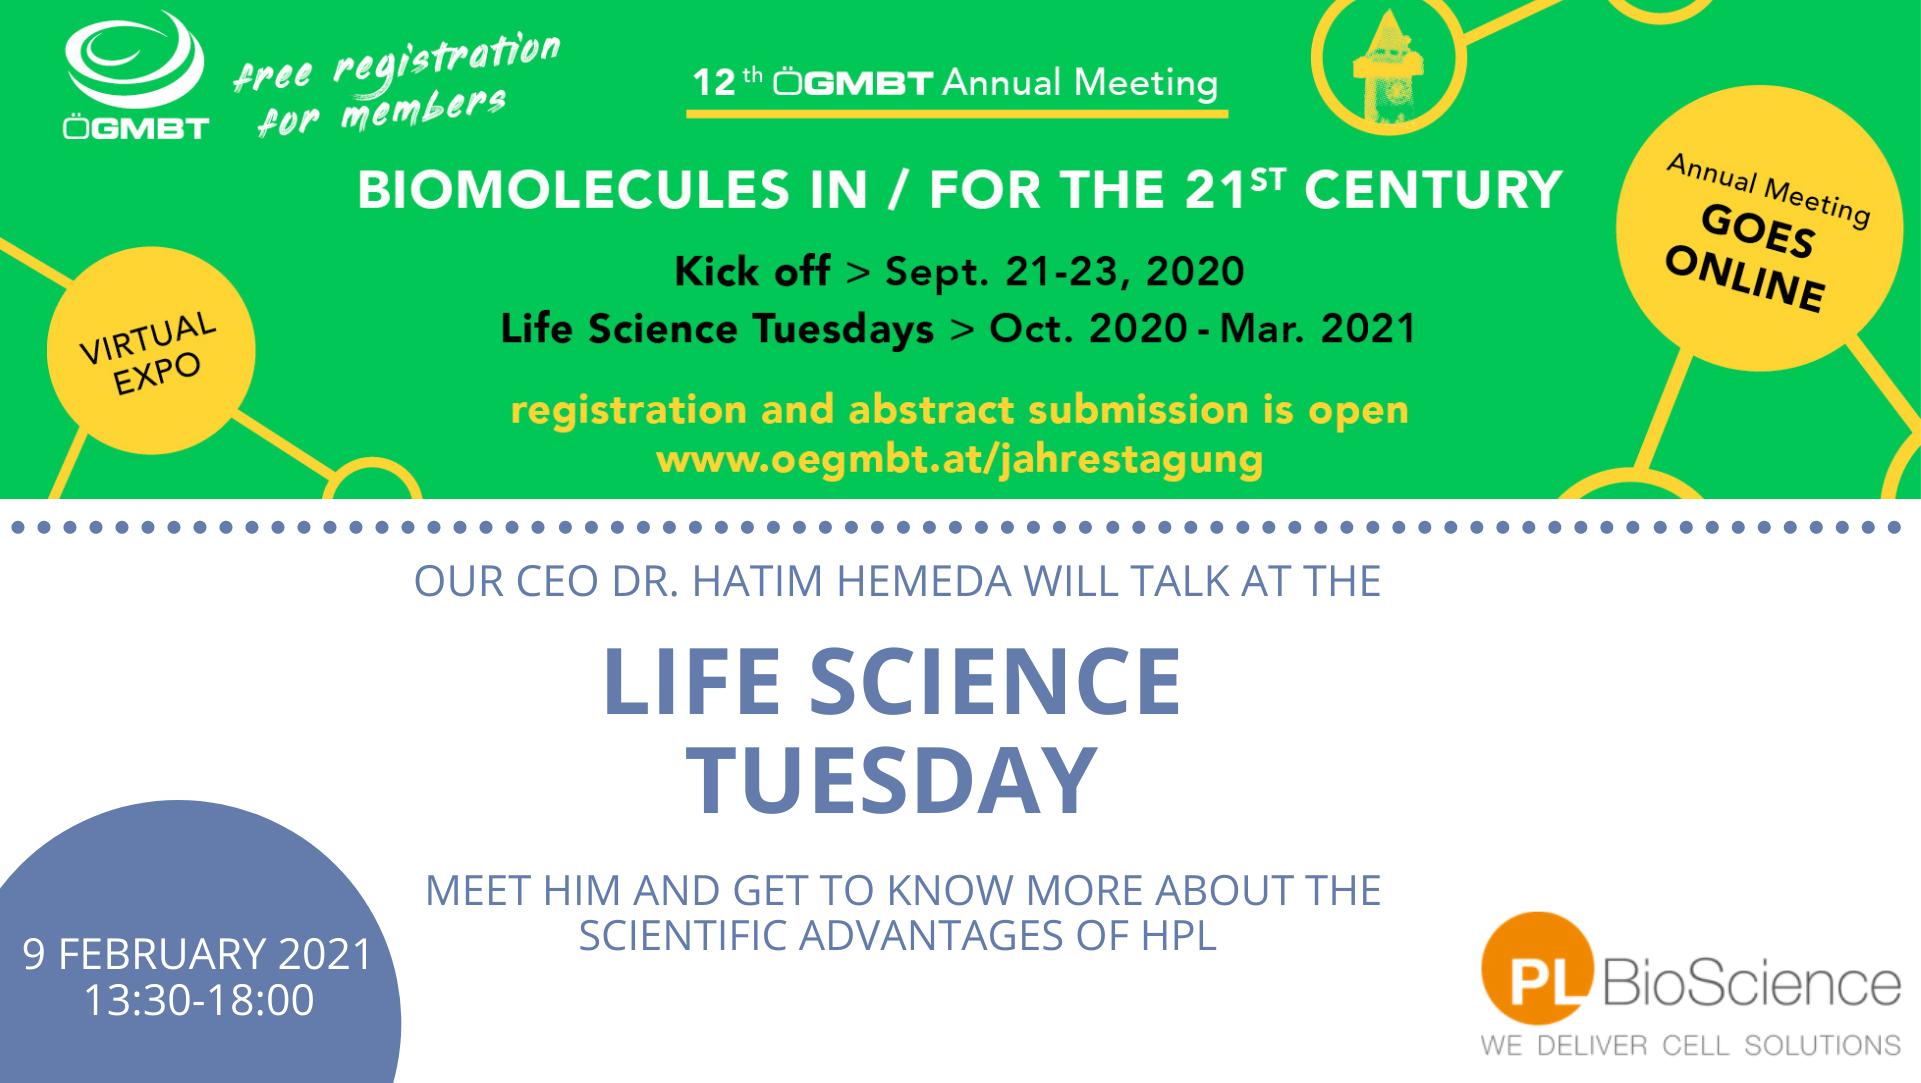 ÖGMBT Life Science Tuesday - HPL in regenerative medicine